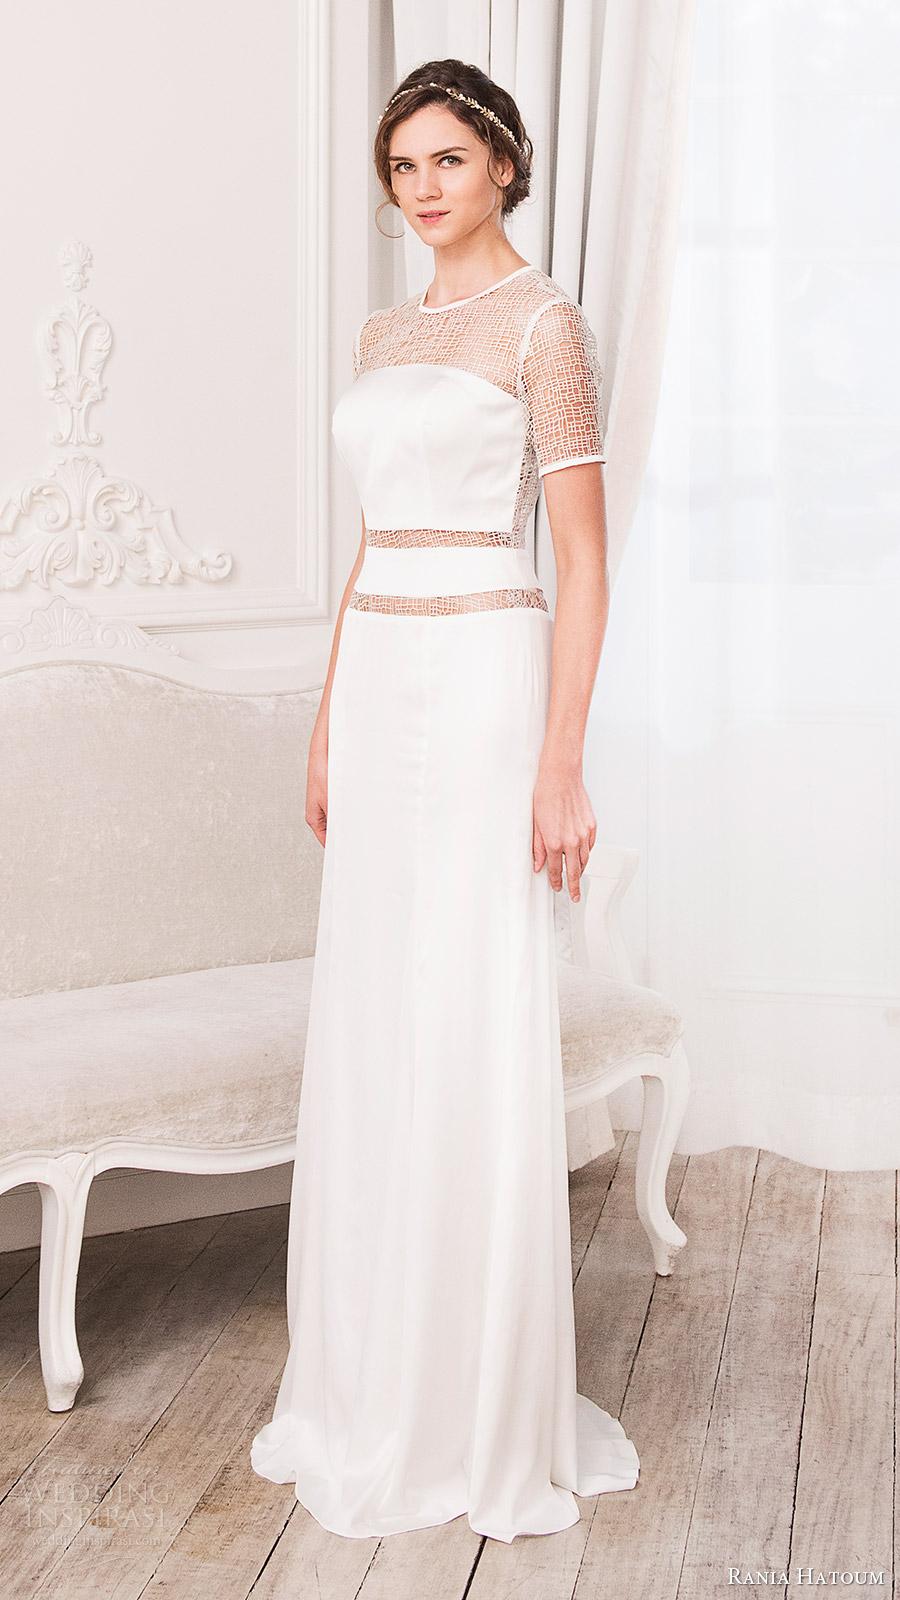 rania hatoum bridal spring 2017 short sleeves crew neck sheath wedding dress (mandy) mv